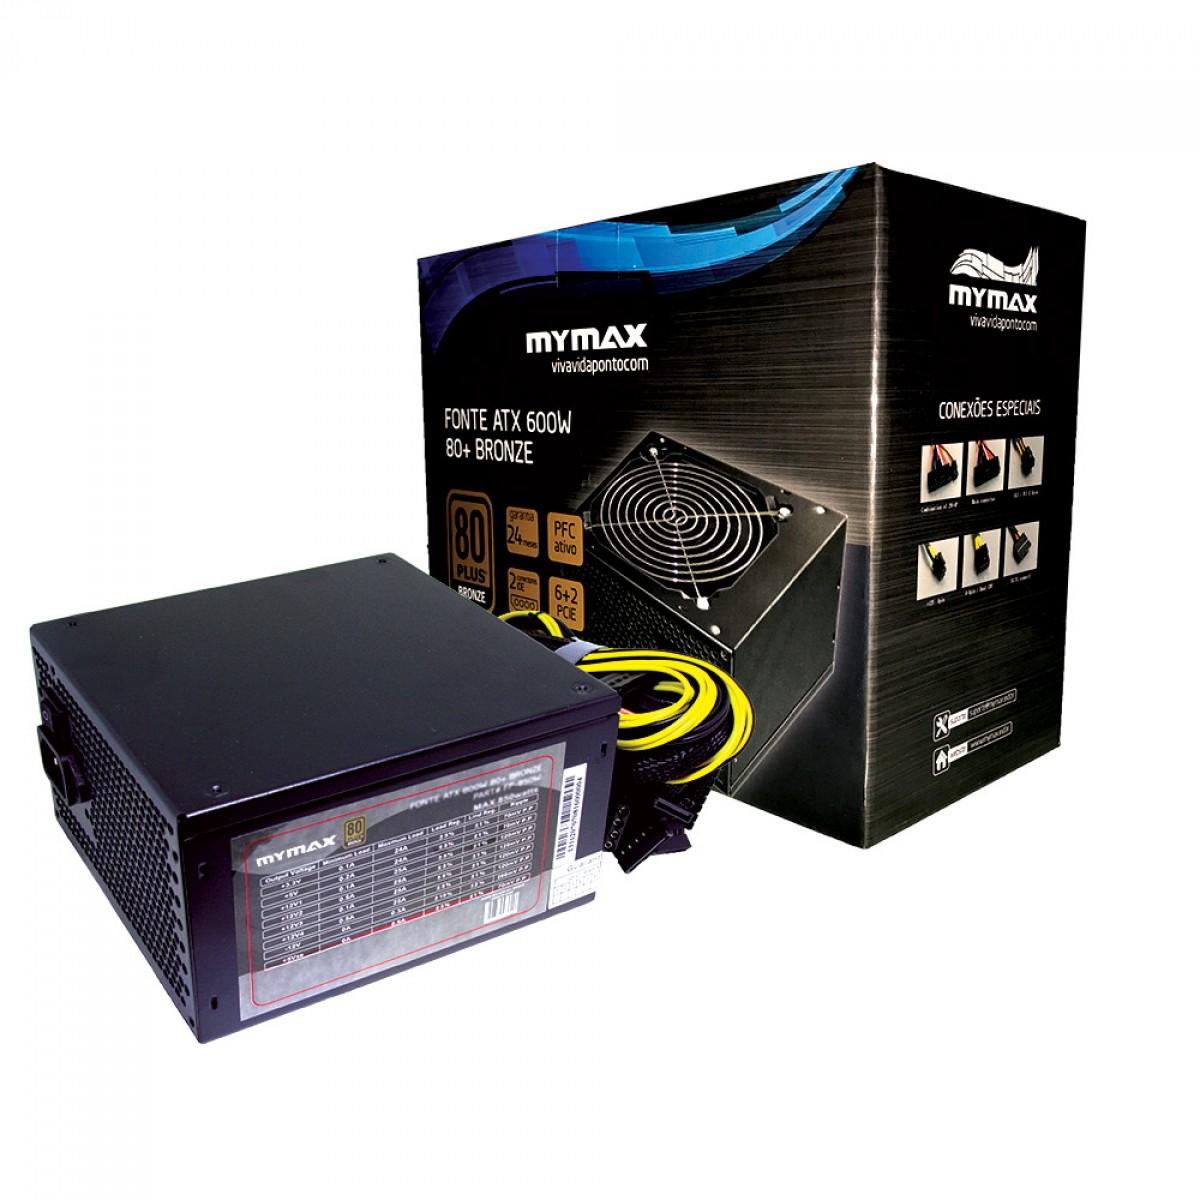 Fonte Mymax ATX 600W MPSU/FP650W 80 Plus Bronze PFC ATIVO